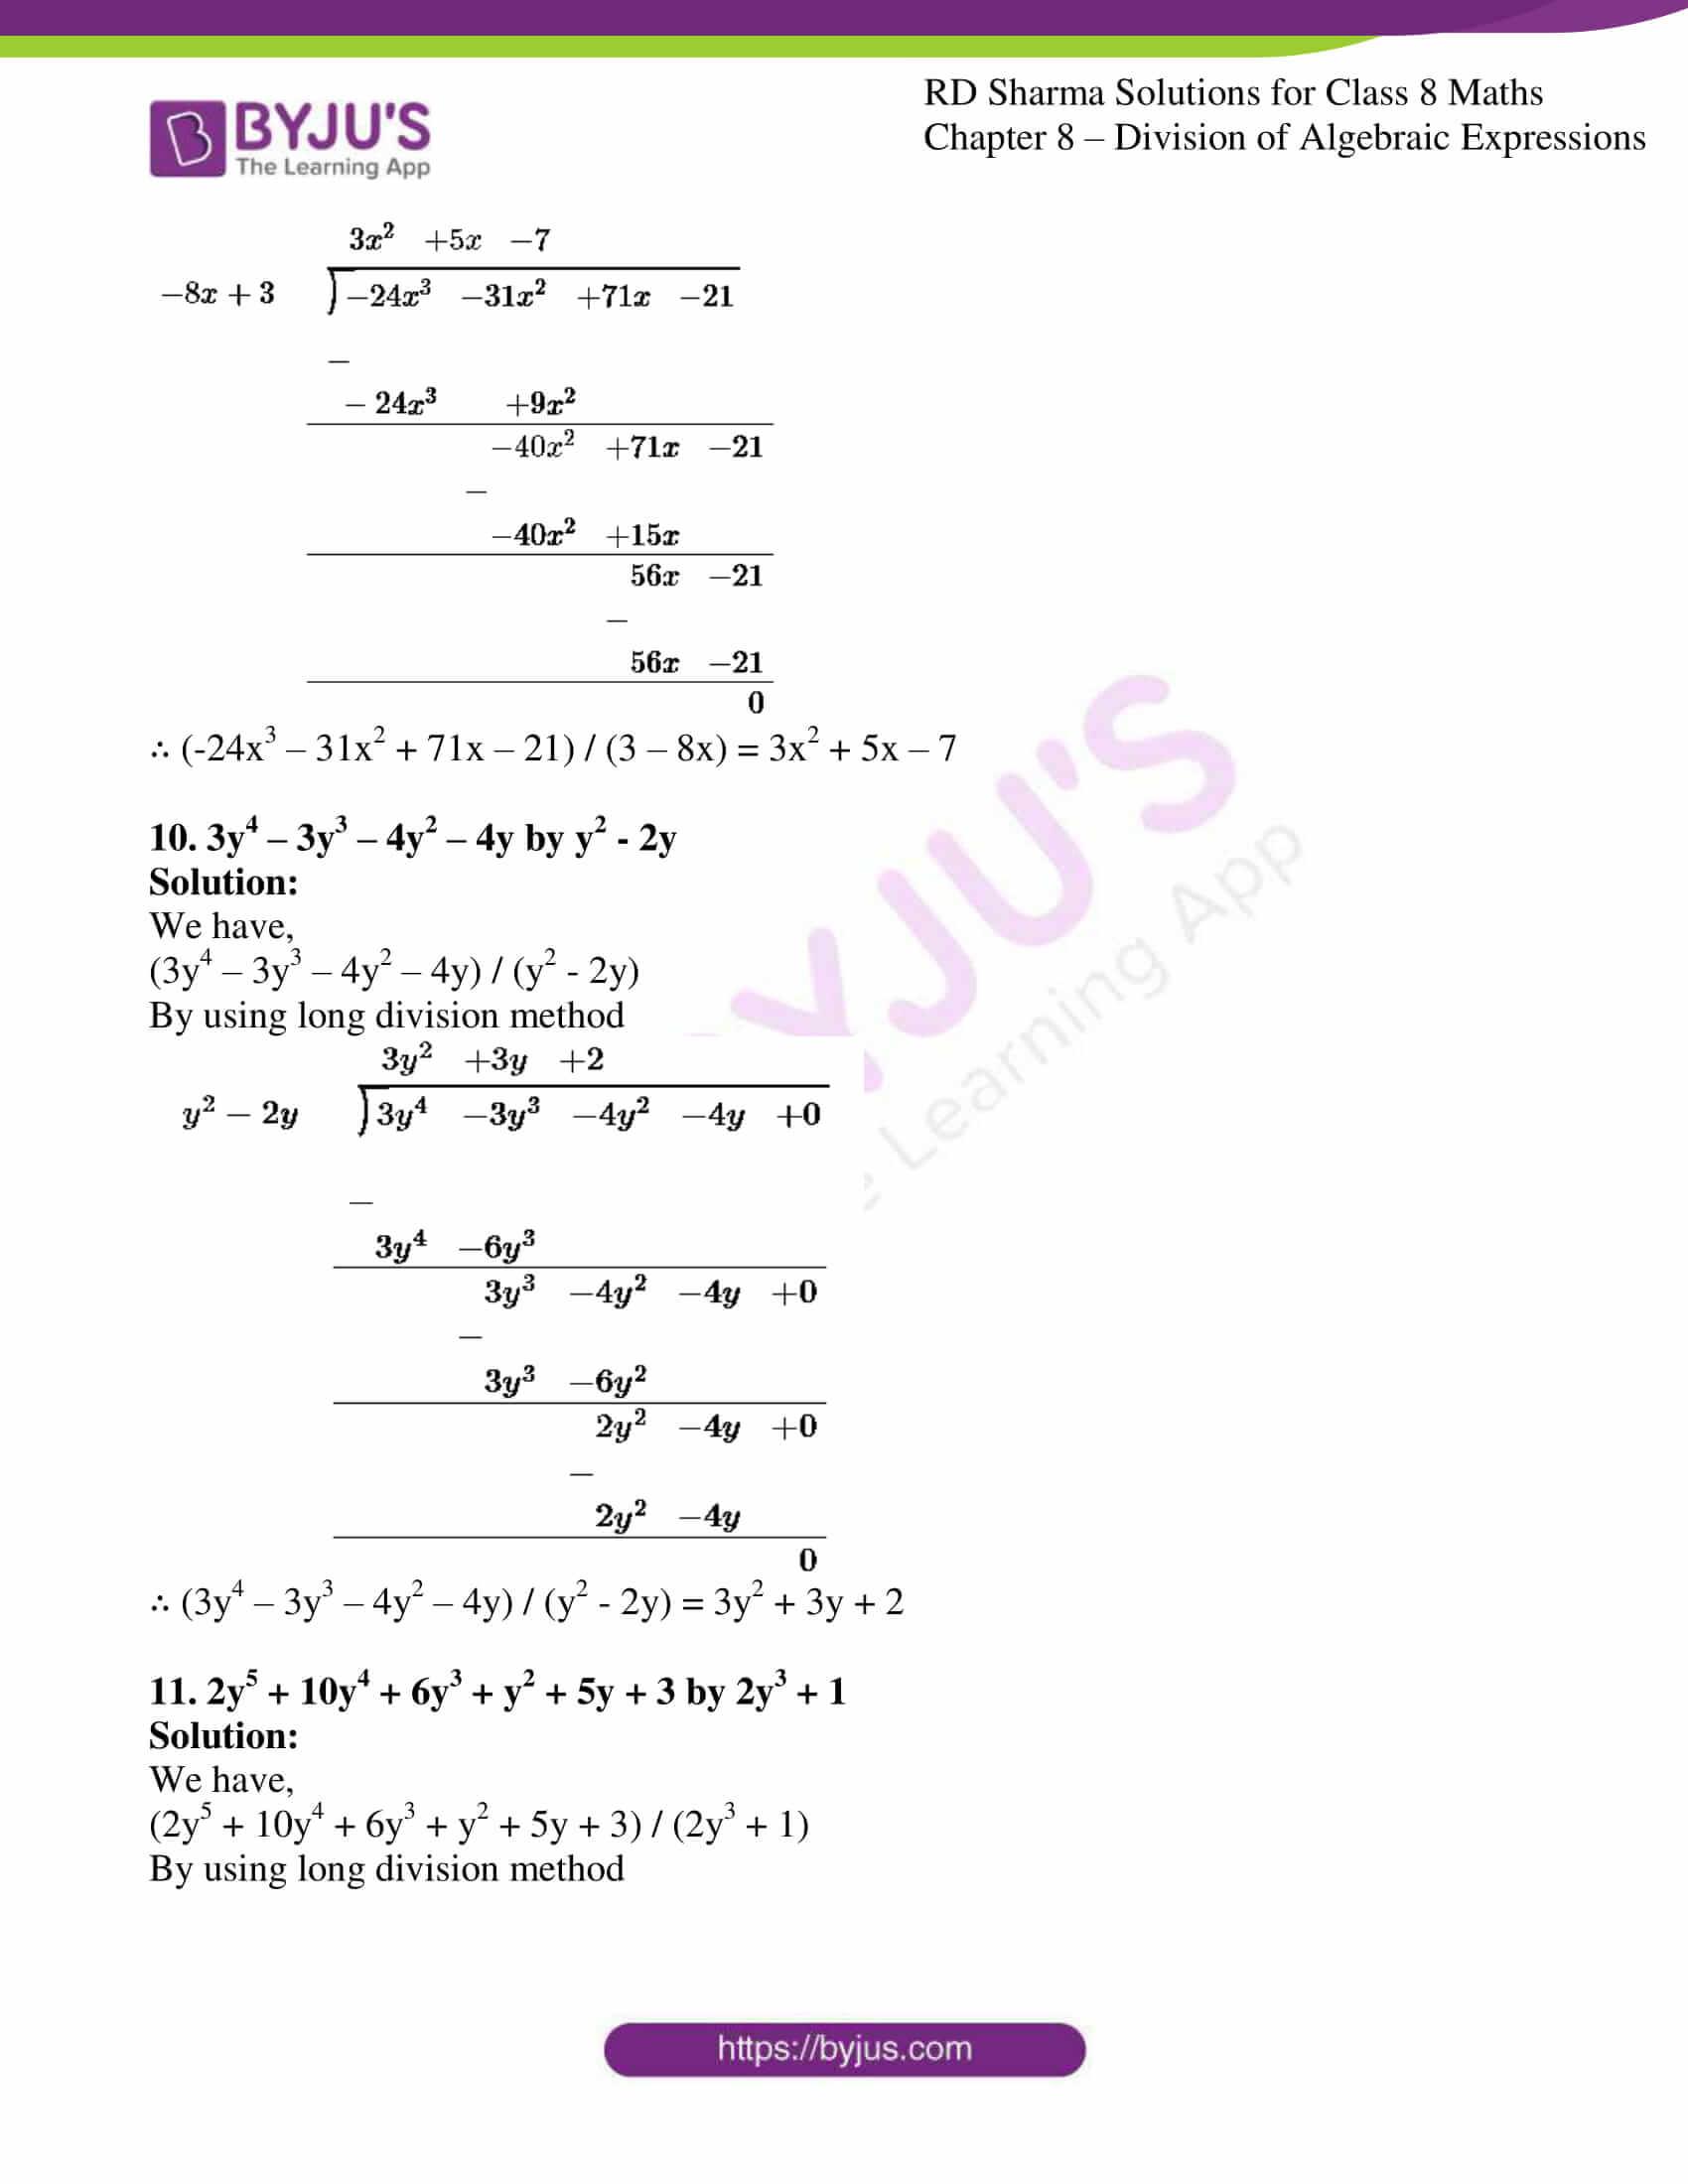 rd sharma class 8 maths chapter 8 exercise 4 04